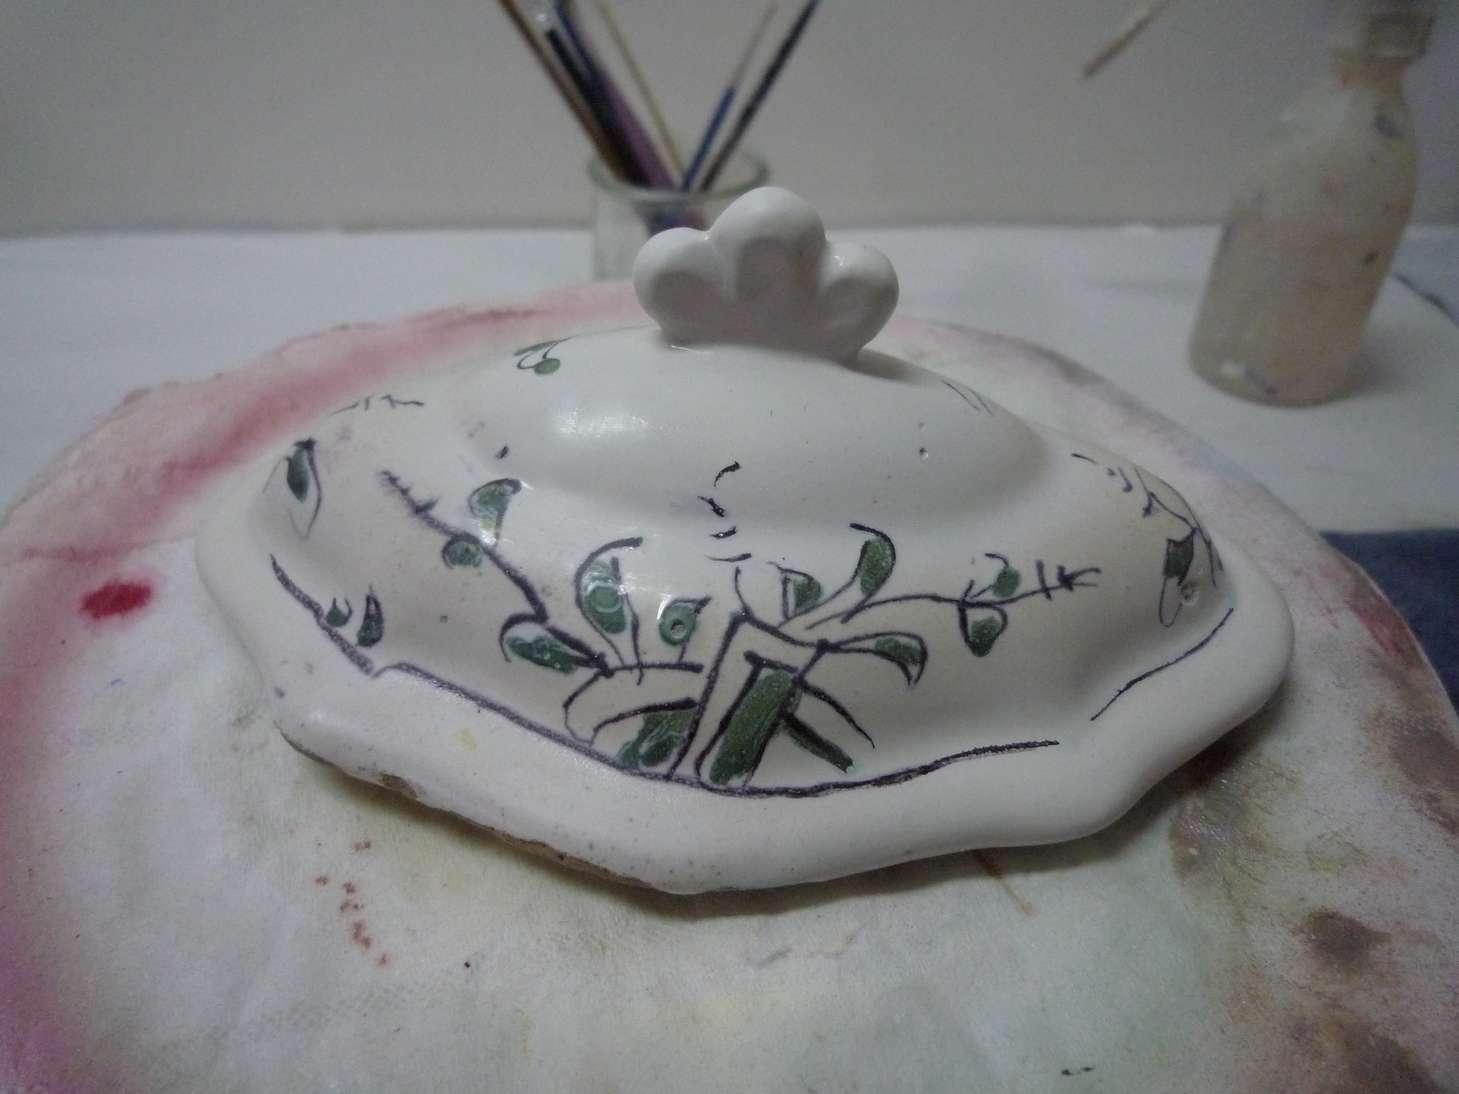 faience-samadet-après-restauration-suppression-anciennes-agraphes-ceramique-art-ancien-restaurarte-creation.jpg